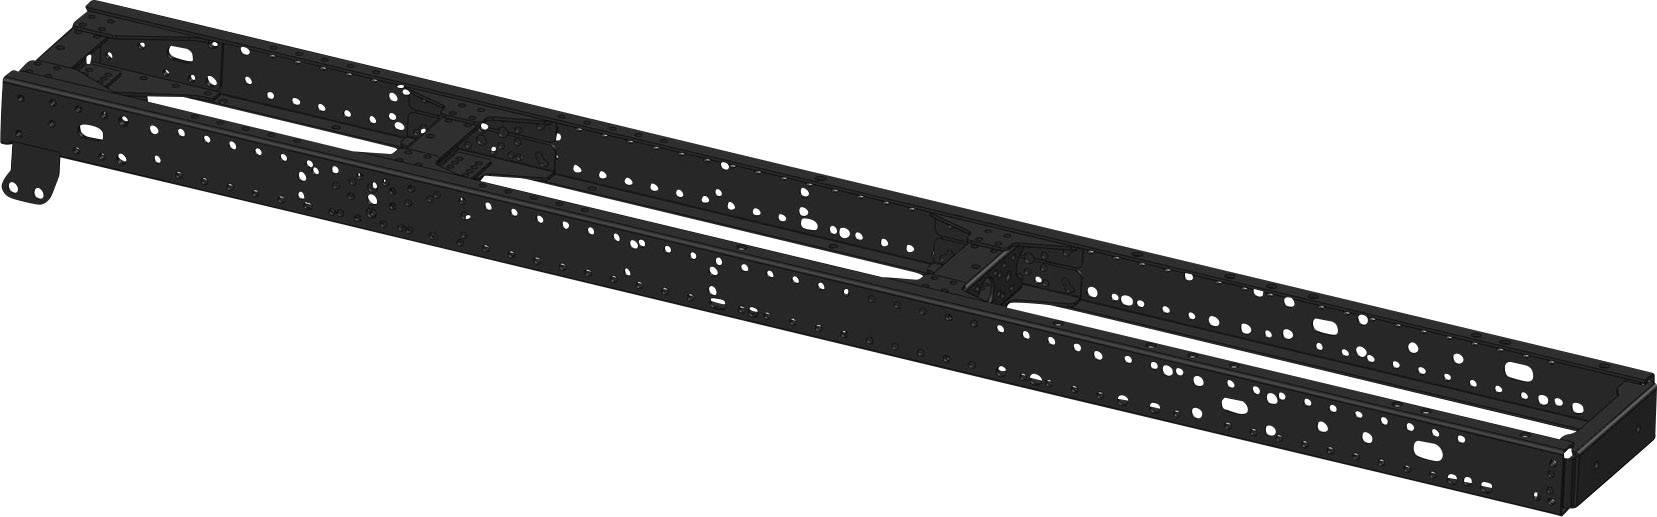 Nosný rám modelu ťahača ScaleArt, Wedico und Tamiya ScaleDrive 71000302, 1:14, 1 sada